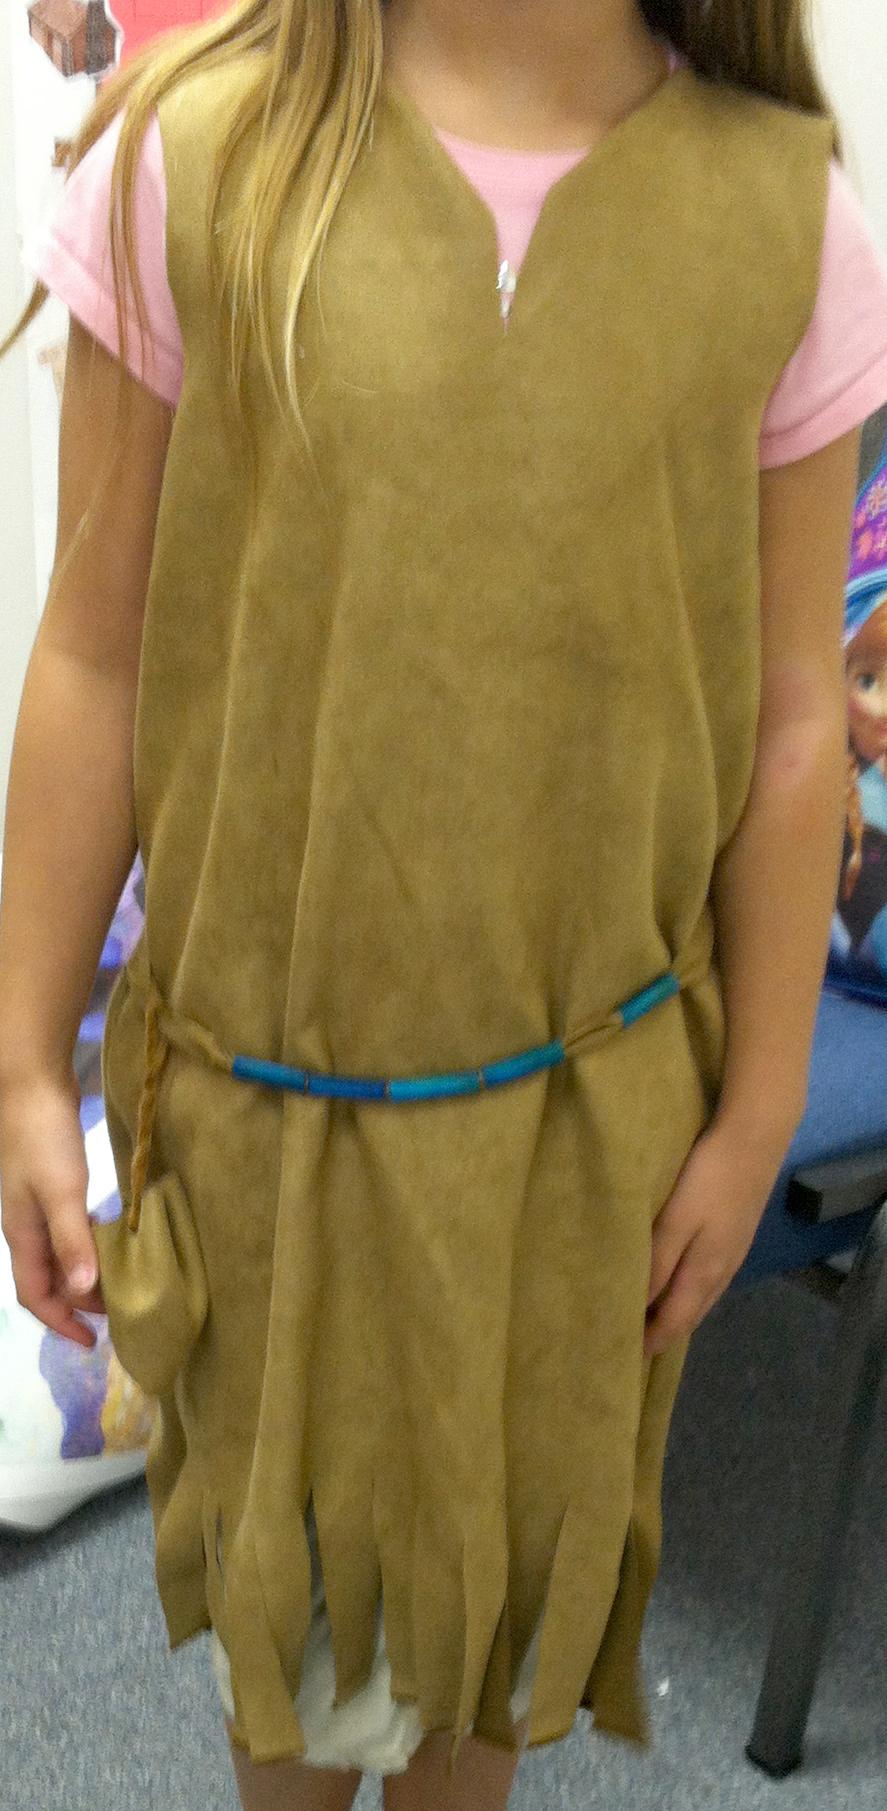 American Indian dress 4